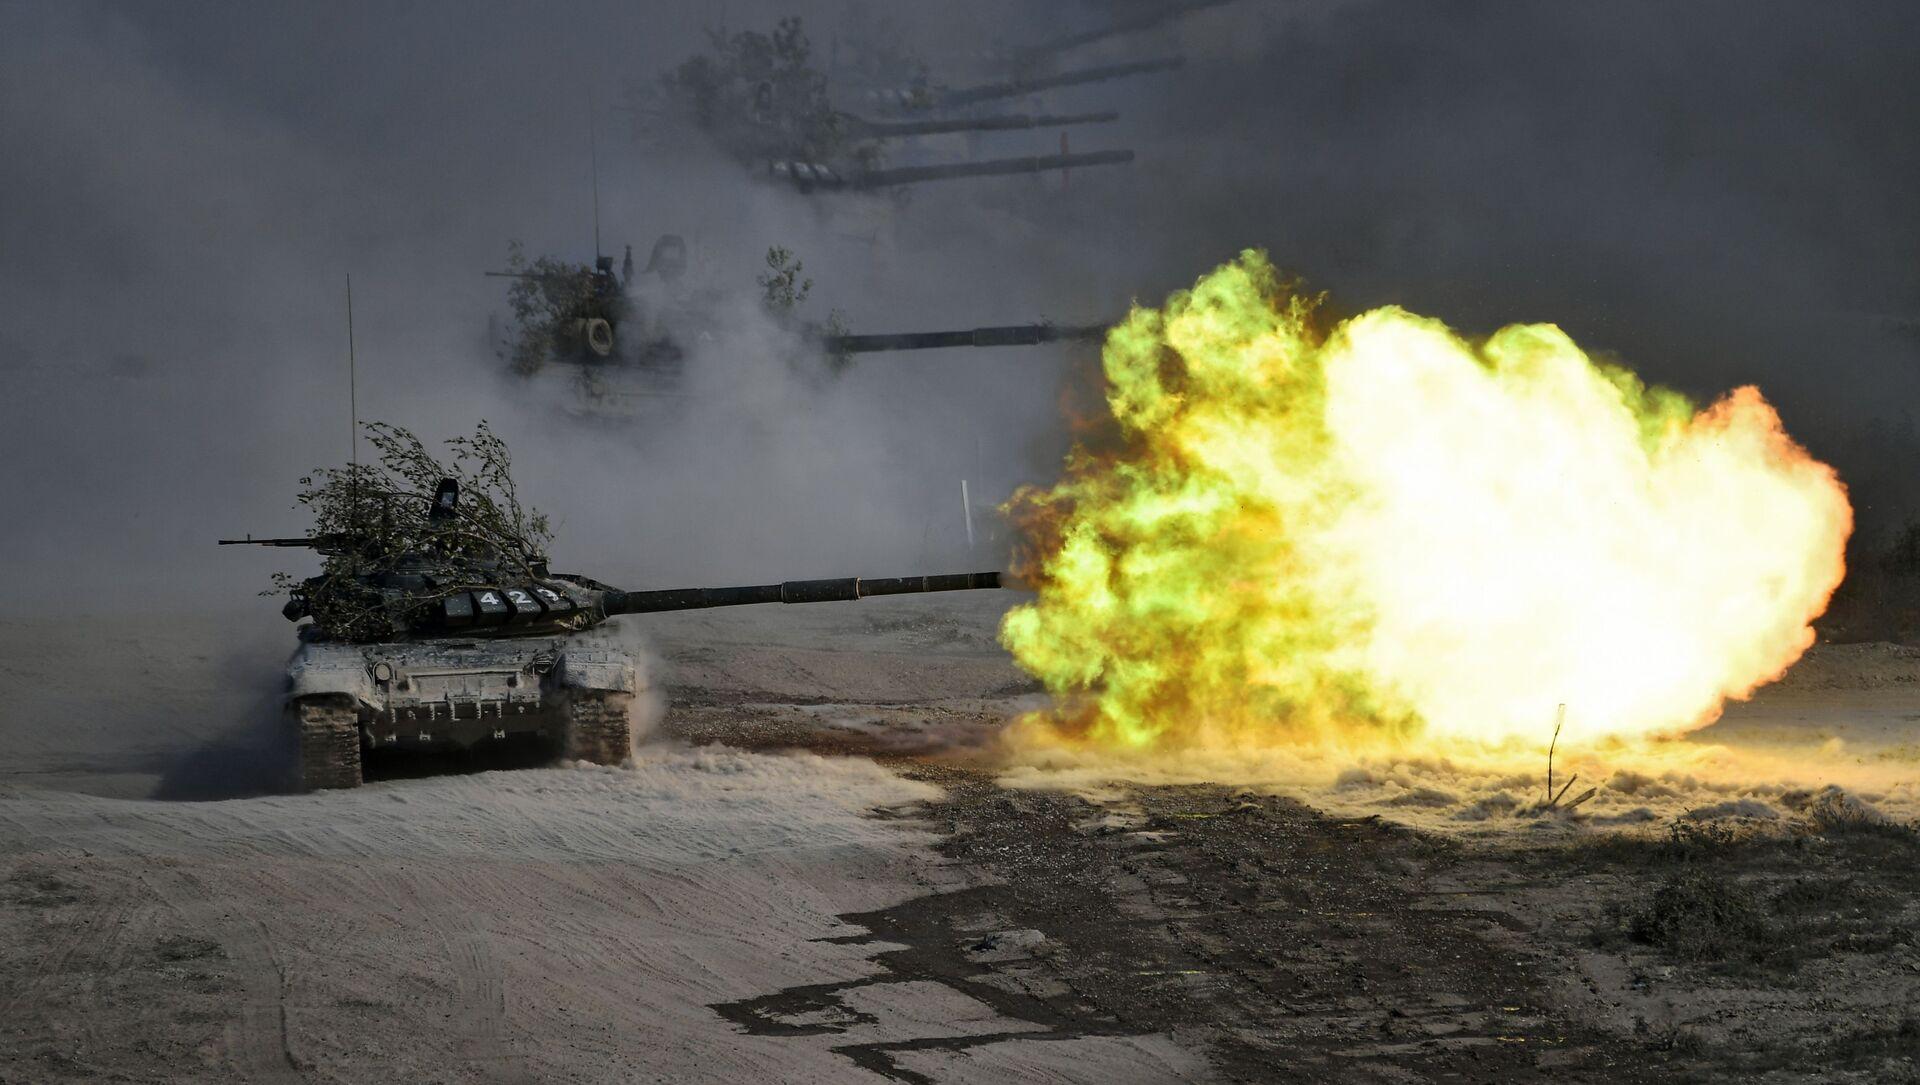 Los tanques T-72 (imagen referencial) - Sputnik Mundo, 1920, 30.09.2020